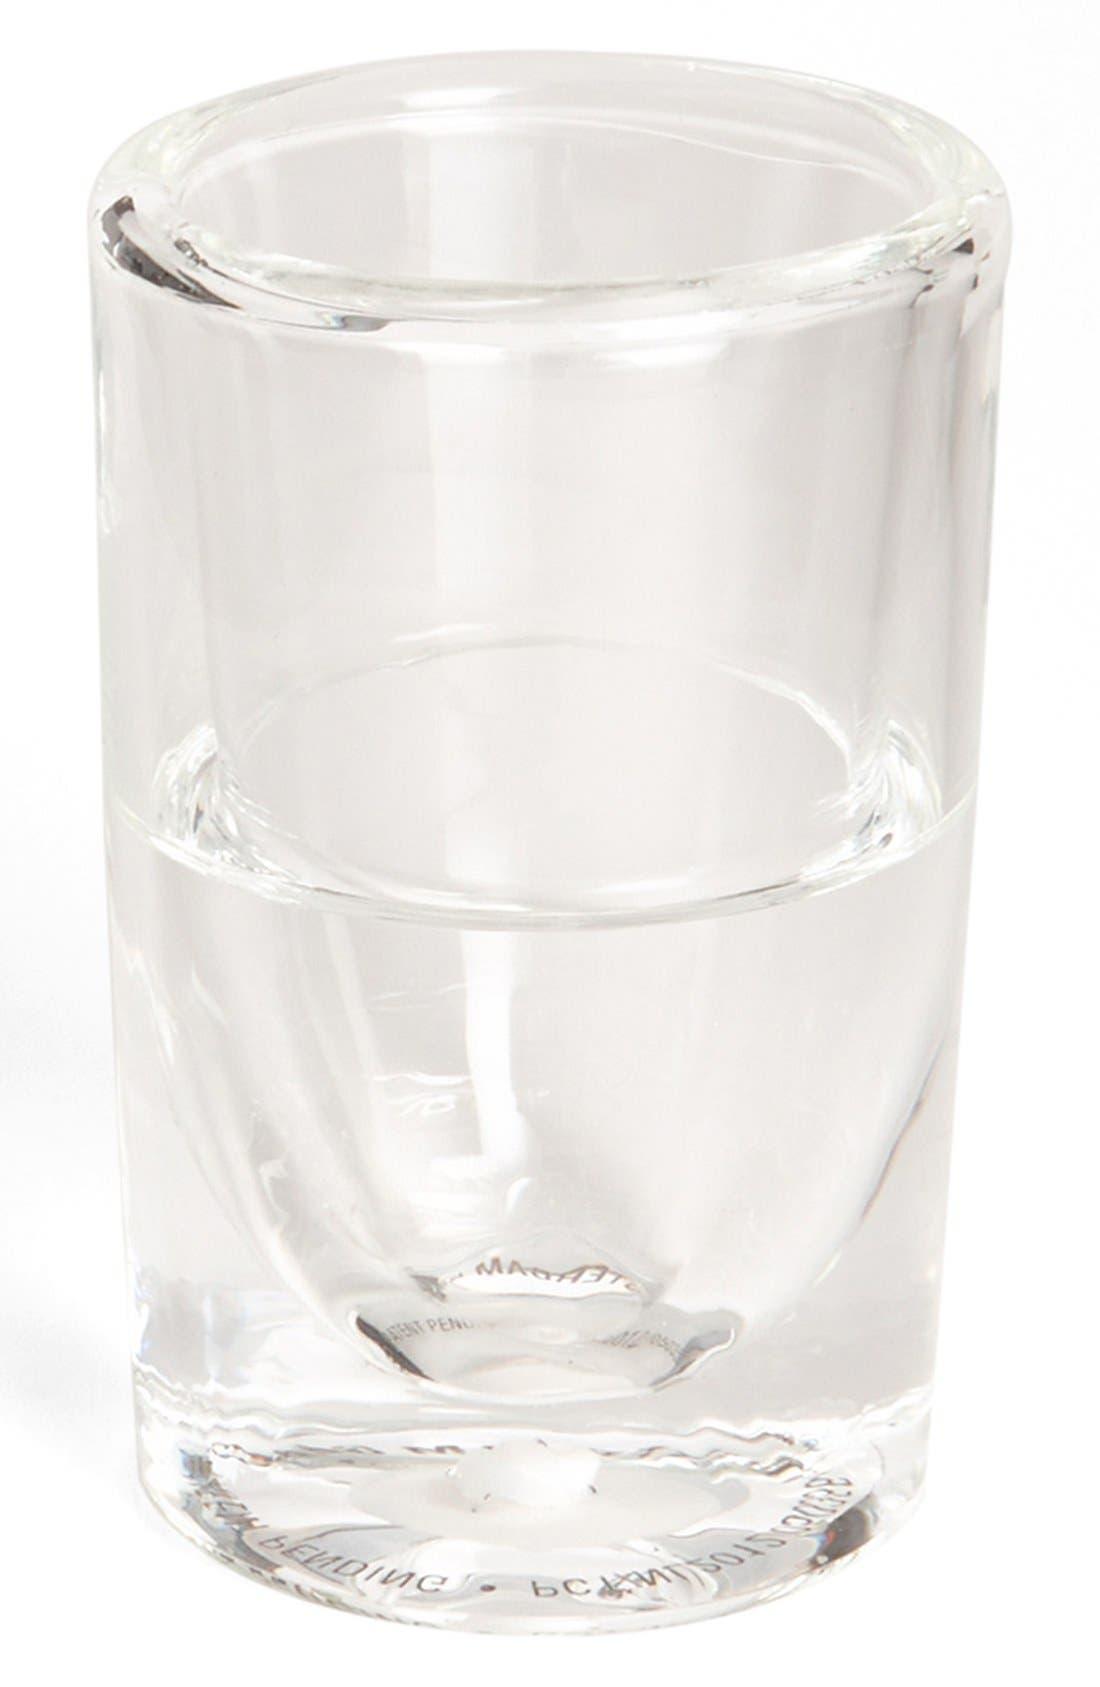 Alternate Image 1 Selected - Amsterdam Glass USA 'Freeze' Shot Glass